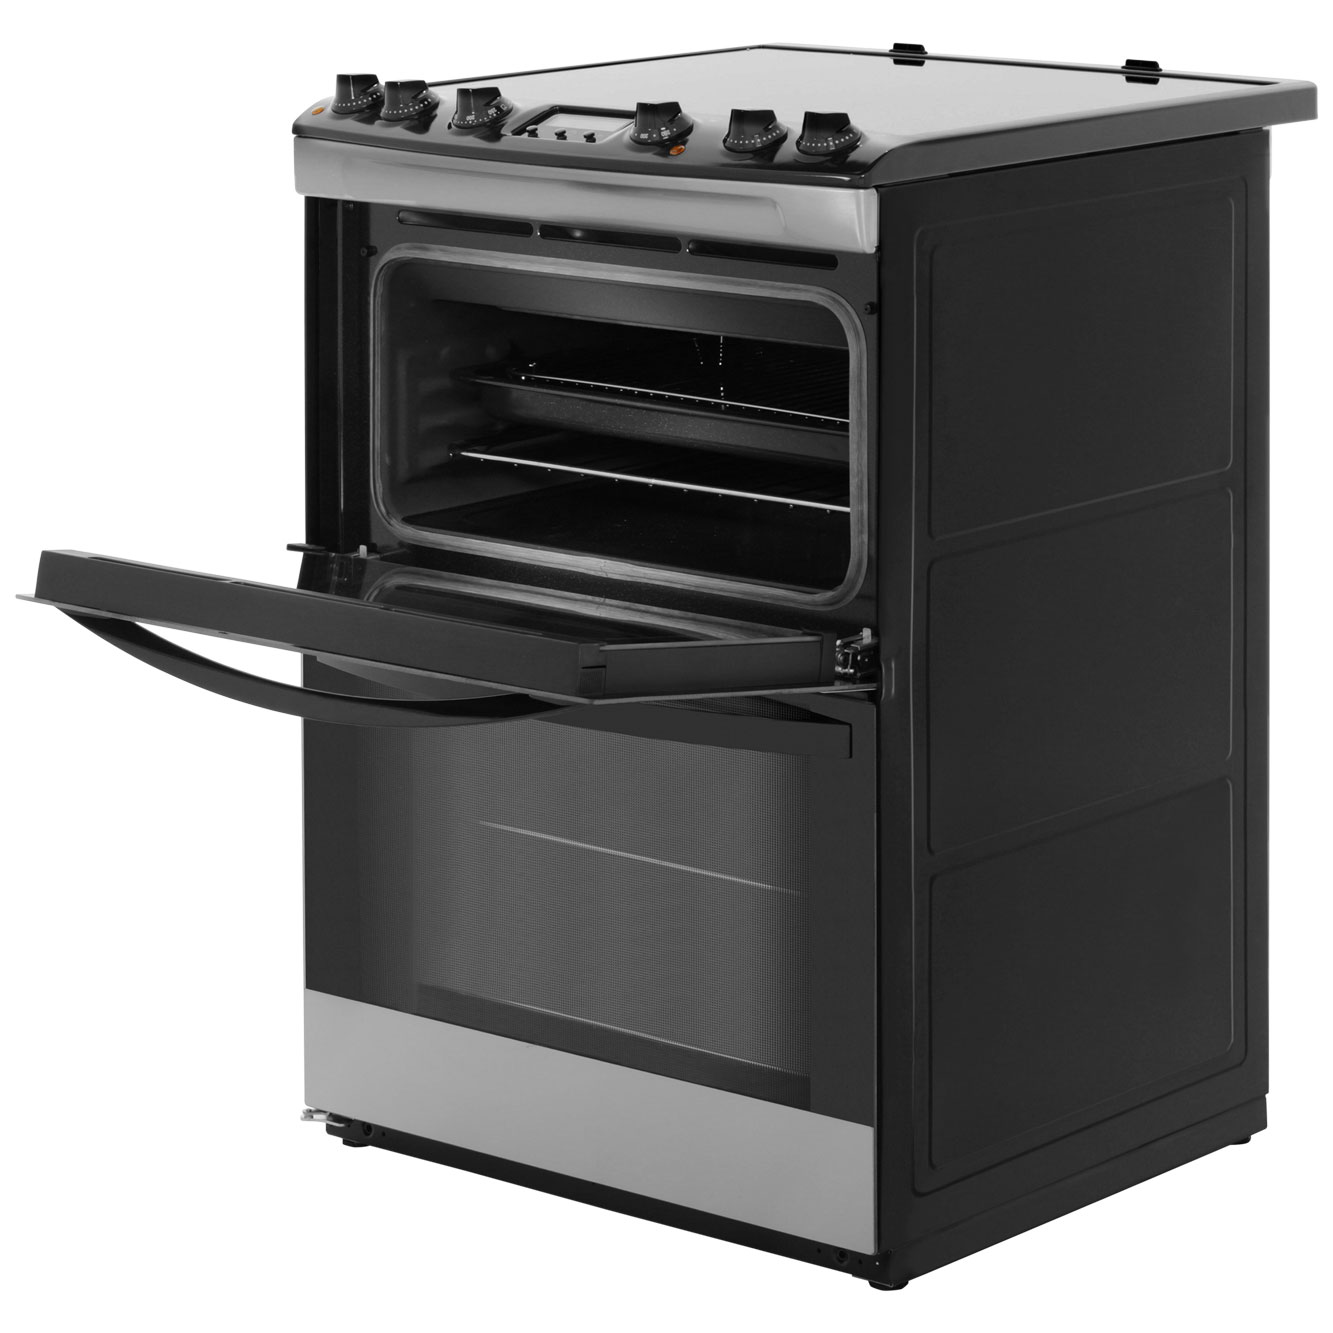 Zanussi Zci68300ba Avanti Free Standing Electric Cooker